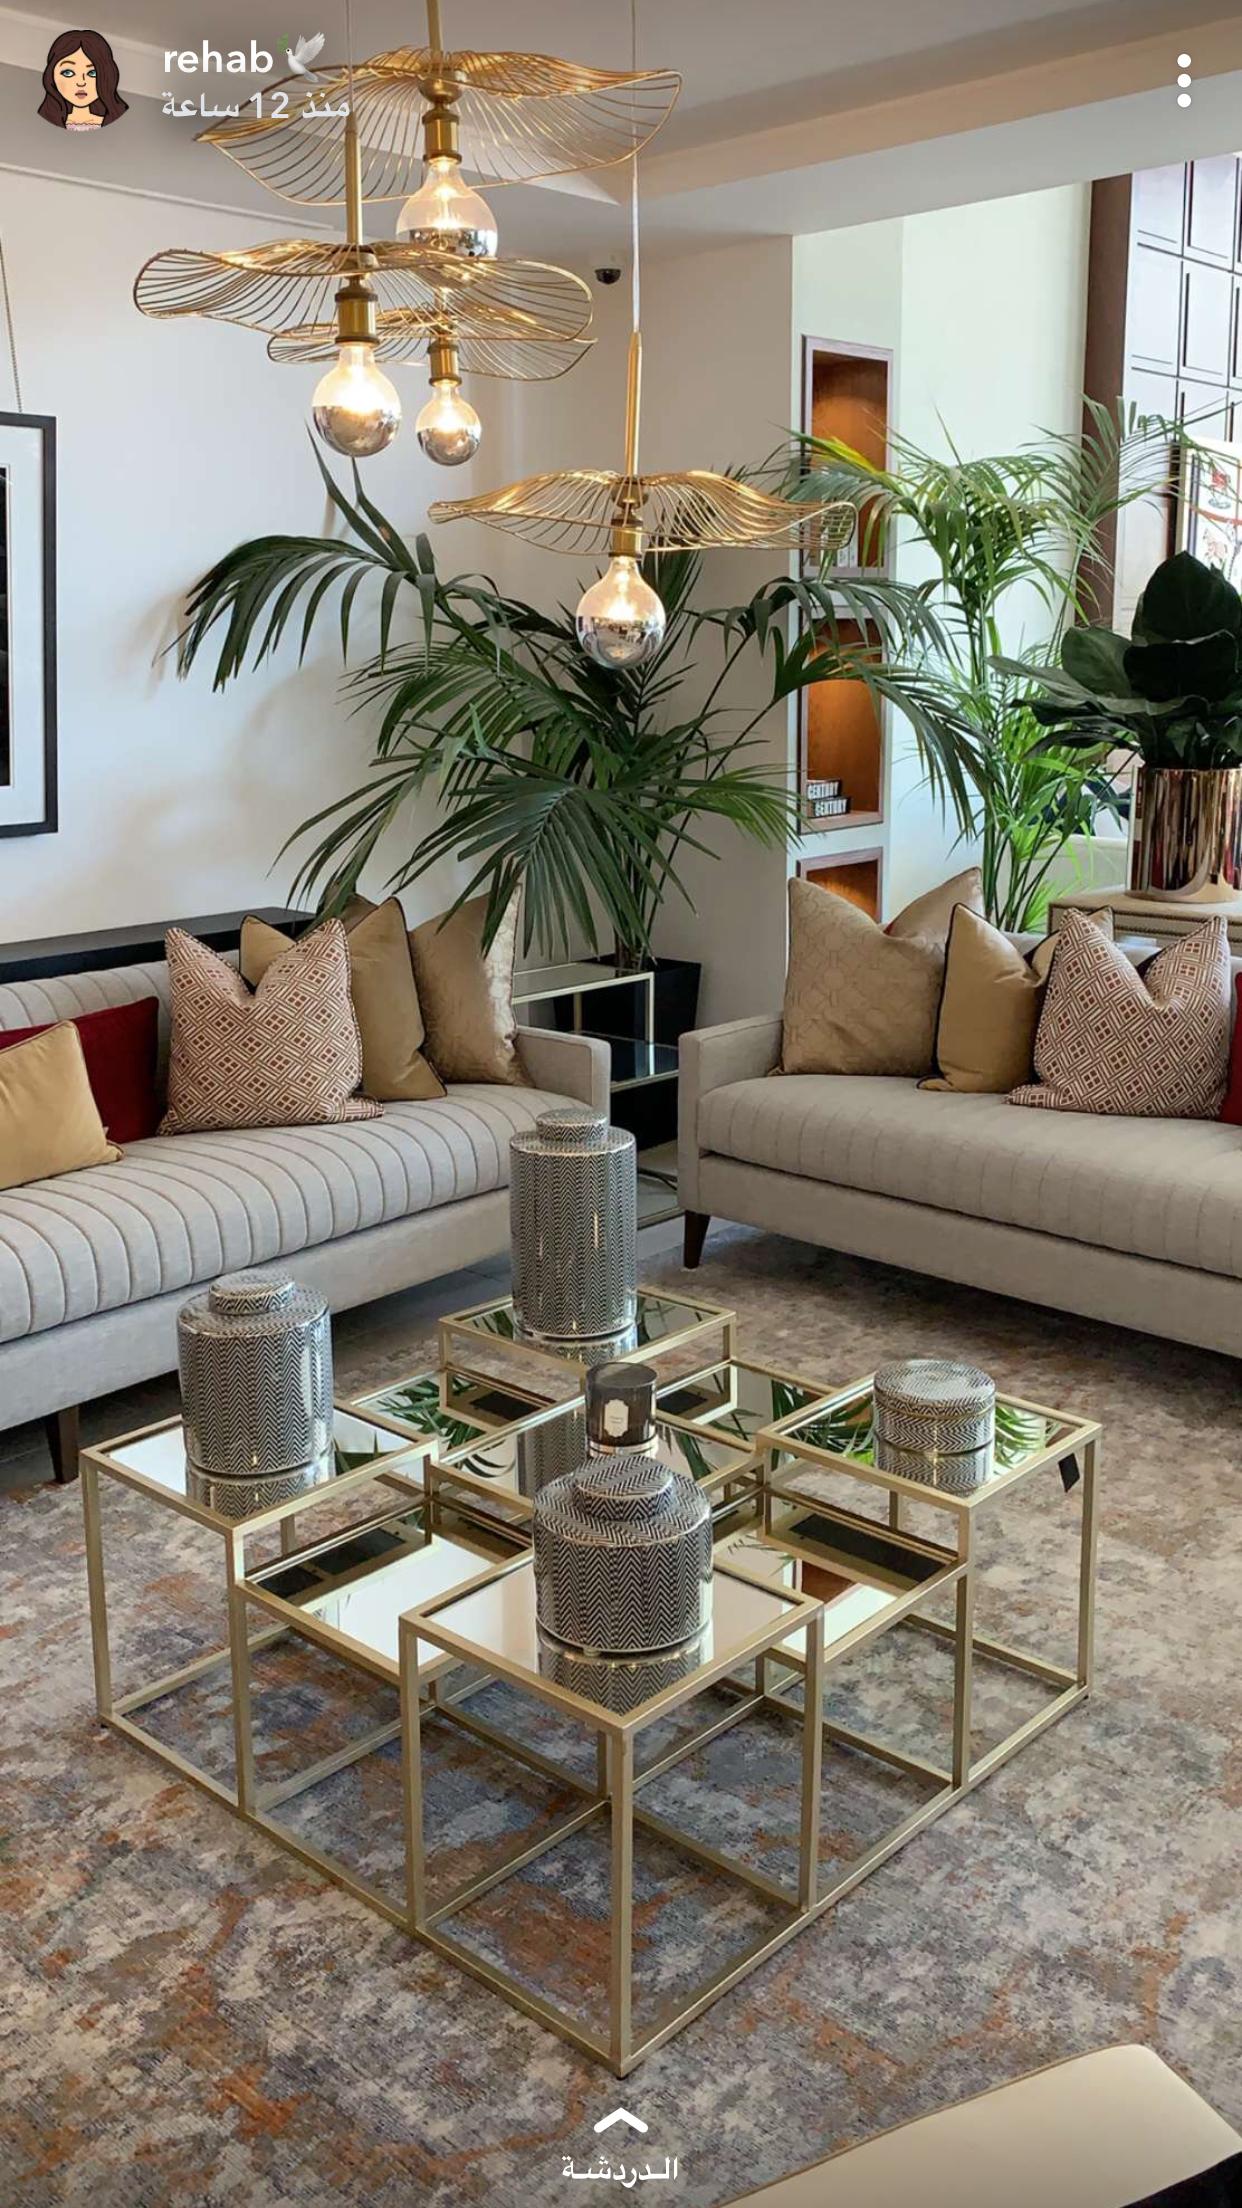 Pin By Nazish Ali On Home Decor Living Room Design Decor Blush Living Room Decor Living Room Sofa Design